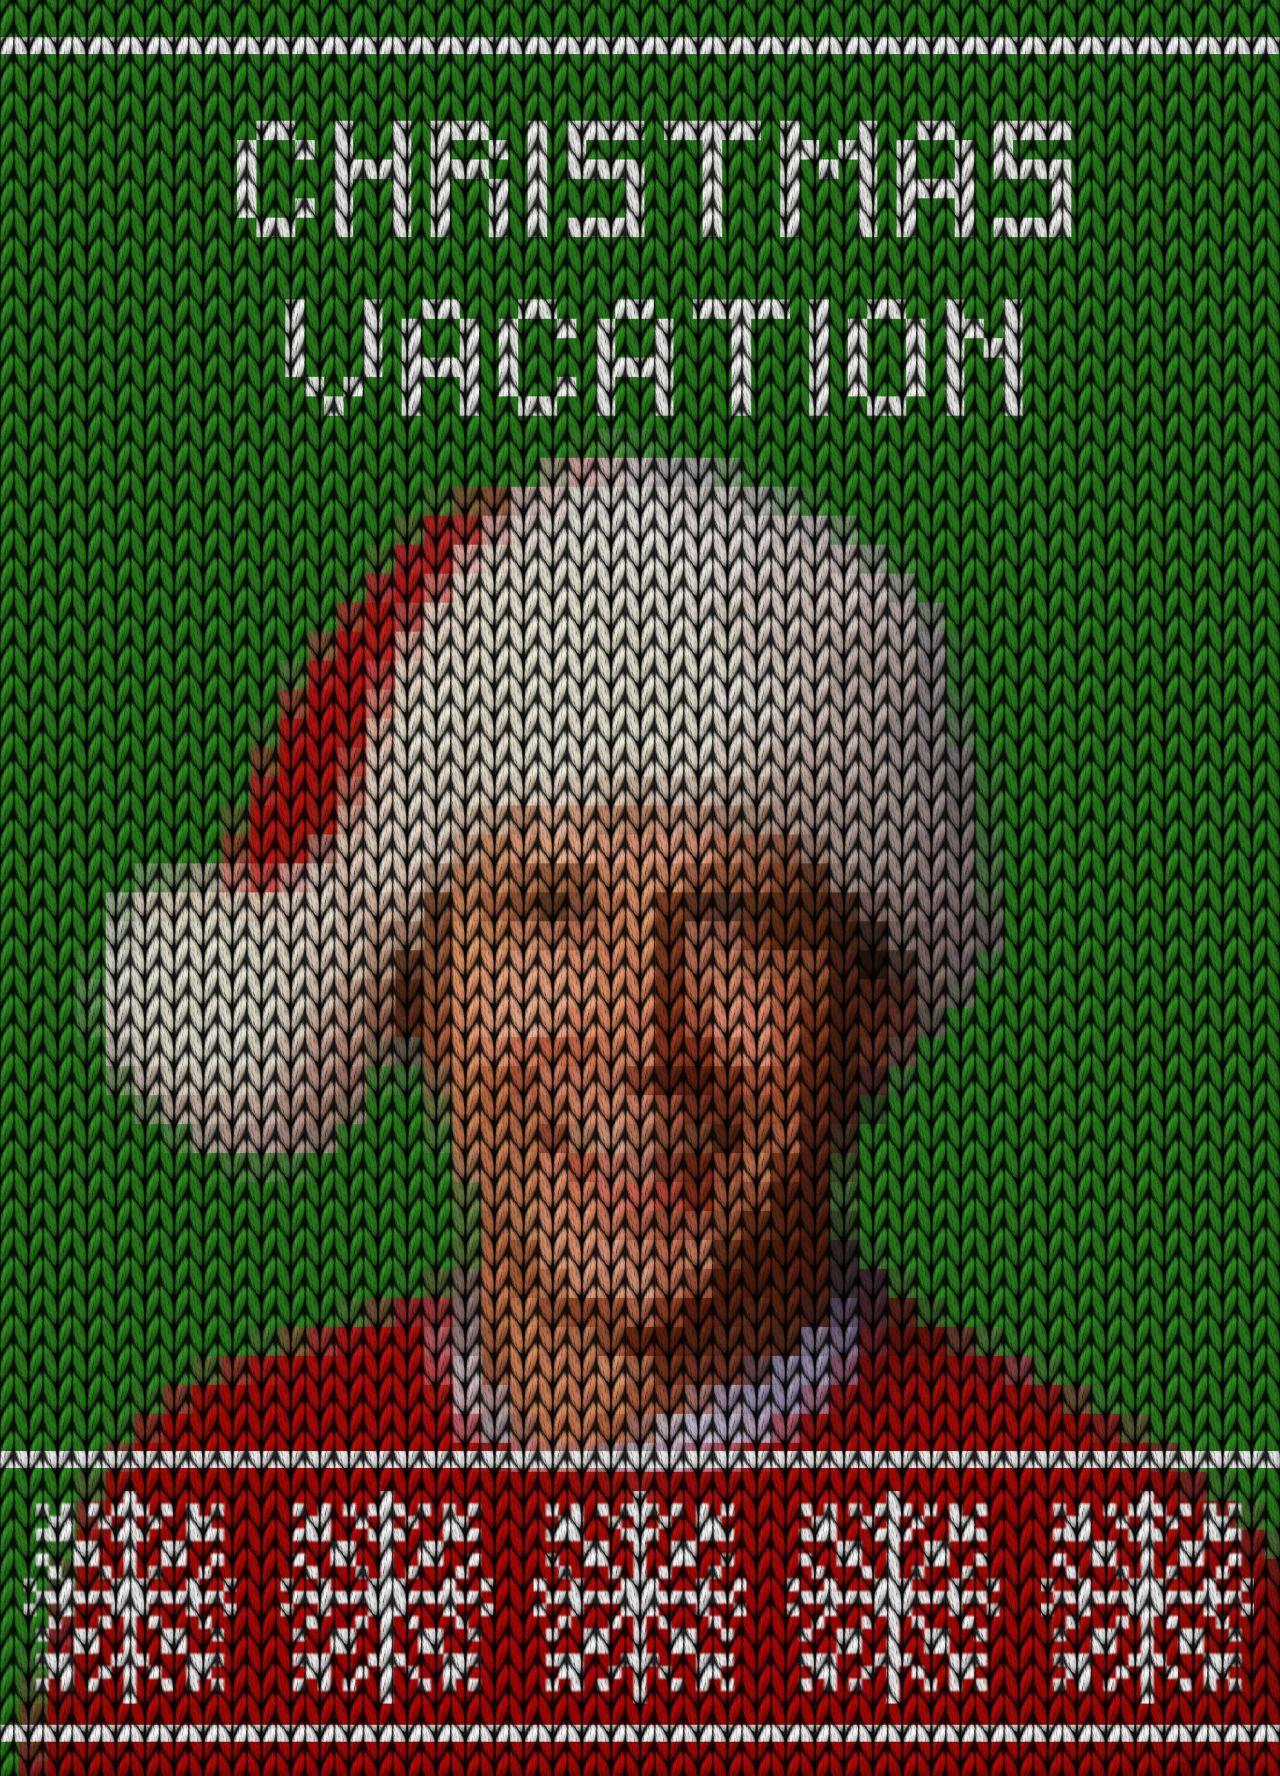 Day 348: National Lampoon's Christmas Vacation. #amovieposteraday